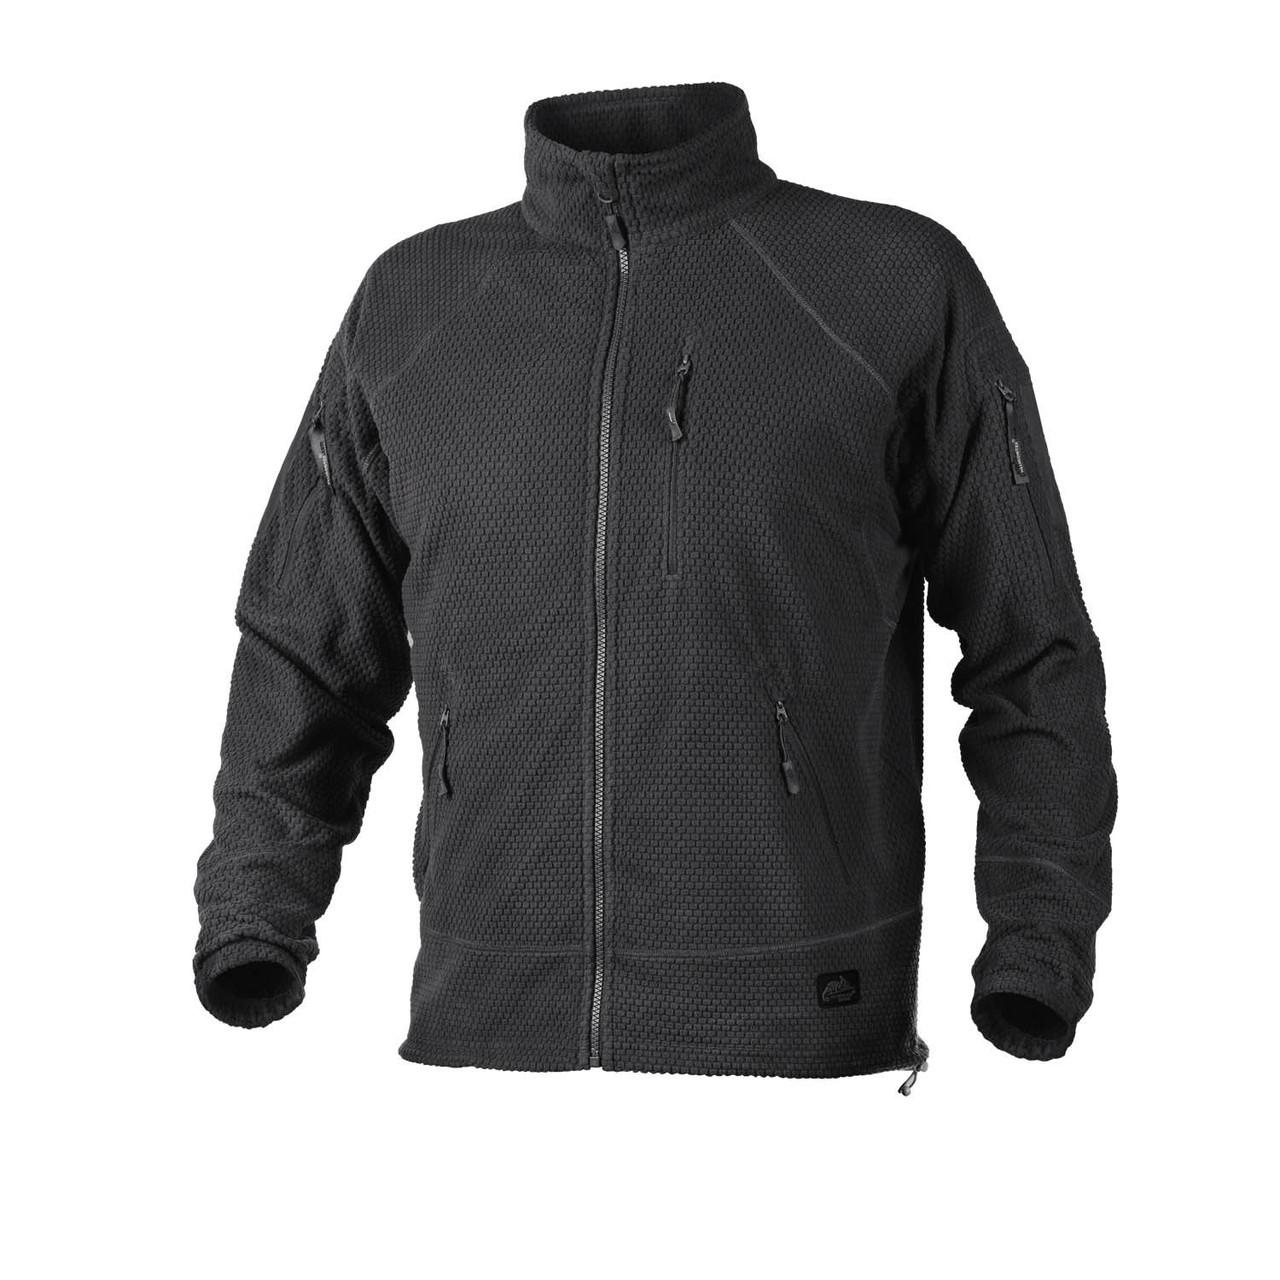 Фліс Helikon-Tex  ALPHA Tactical Jacket. BLACK, L